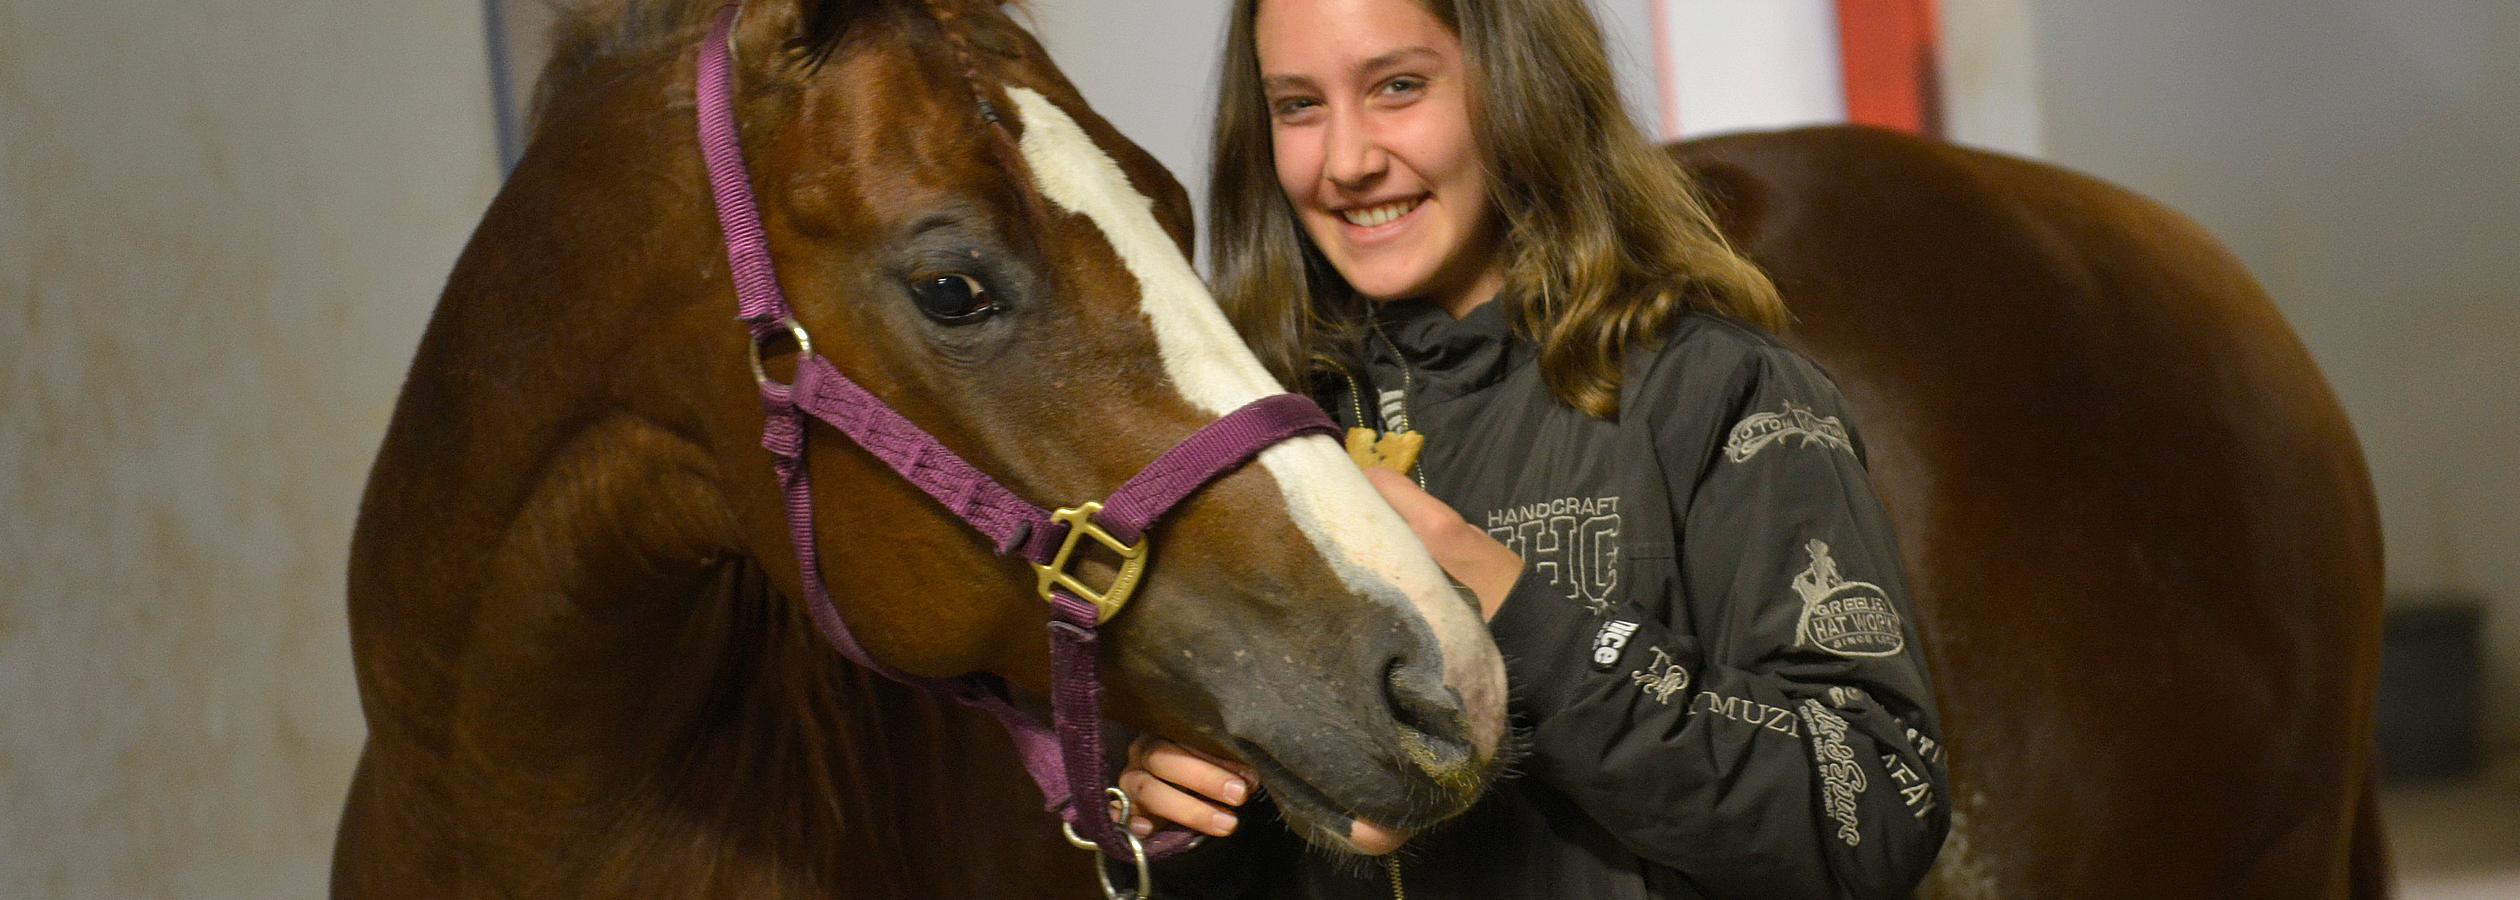 Header_HorseAcademy_AGA3119